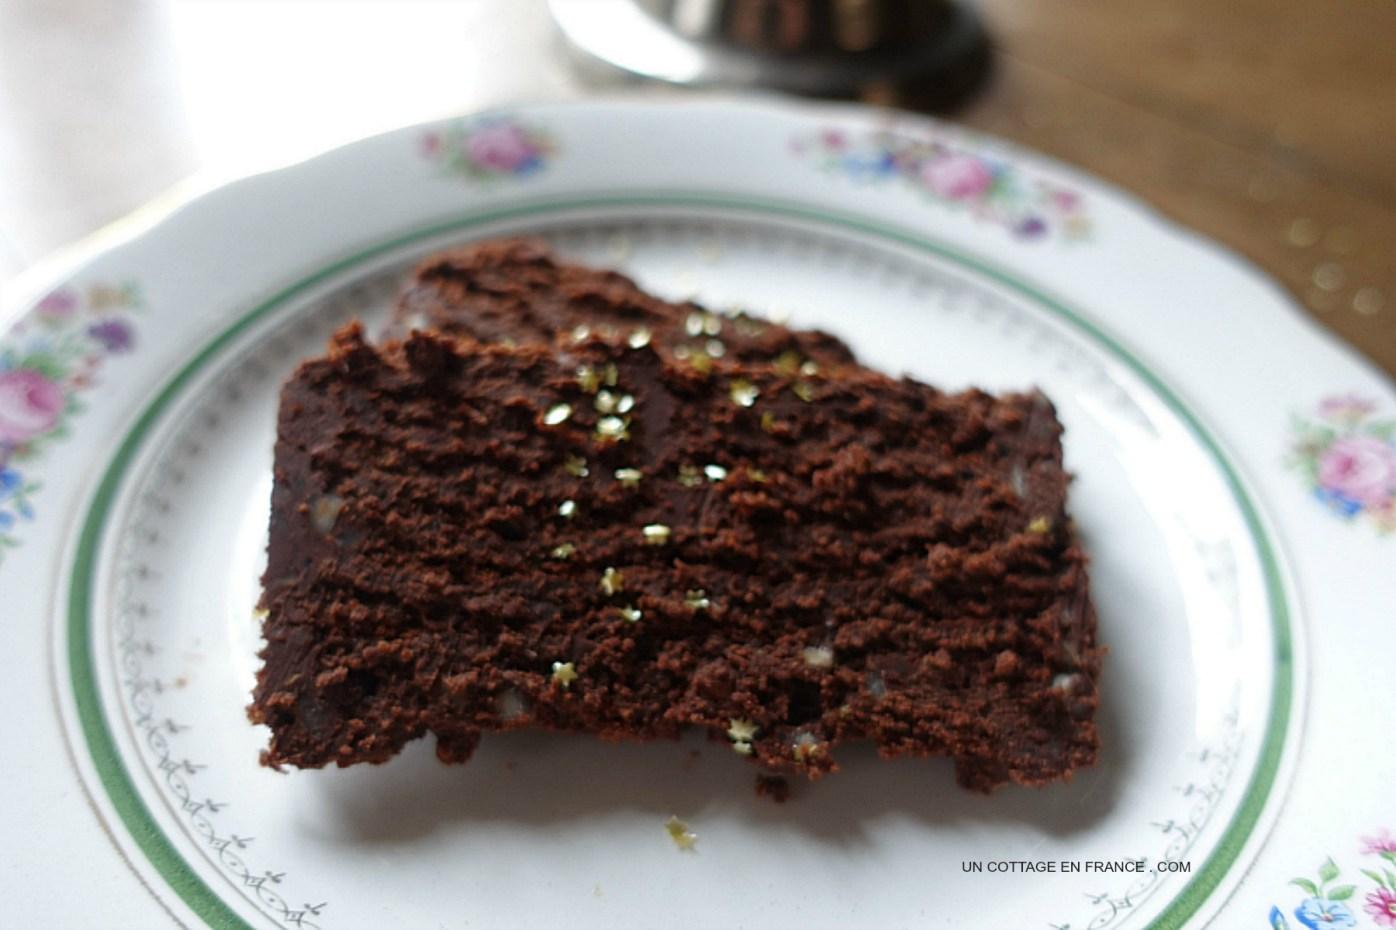 Gâteau au chocolat (A French chocolate log cake)